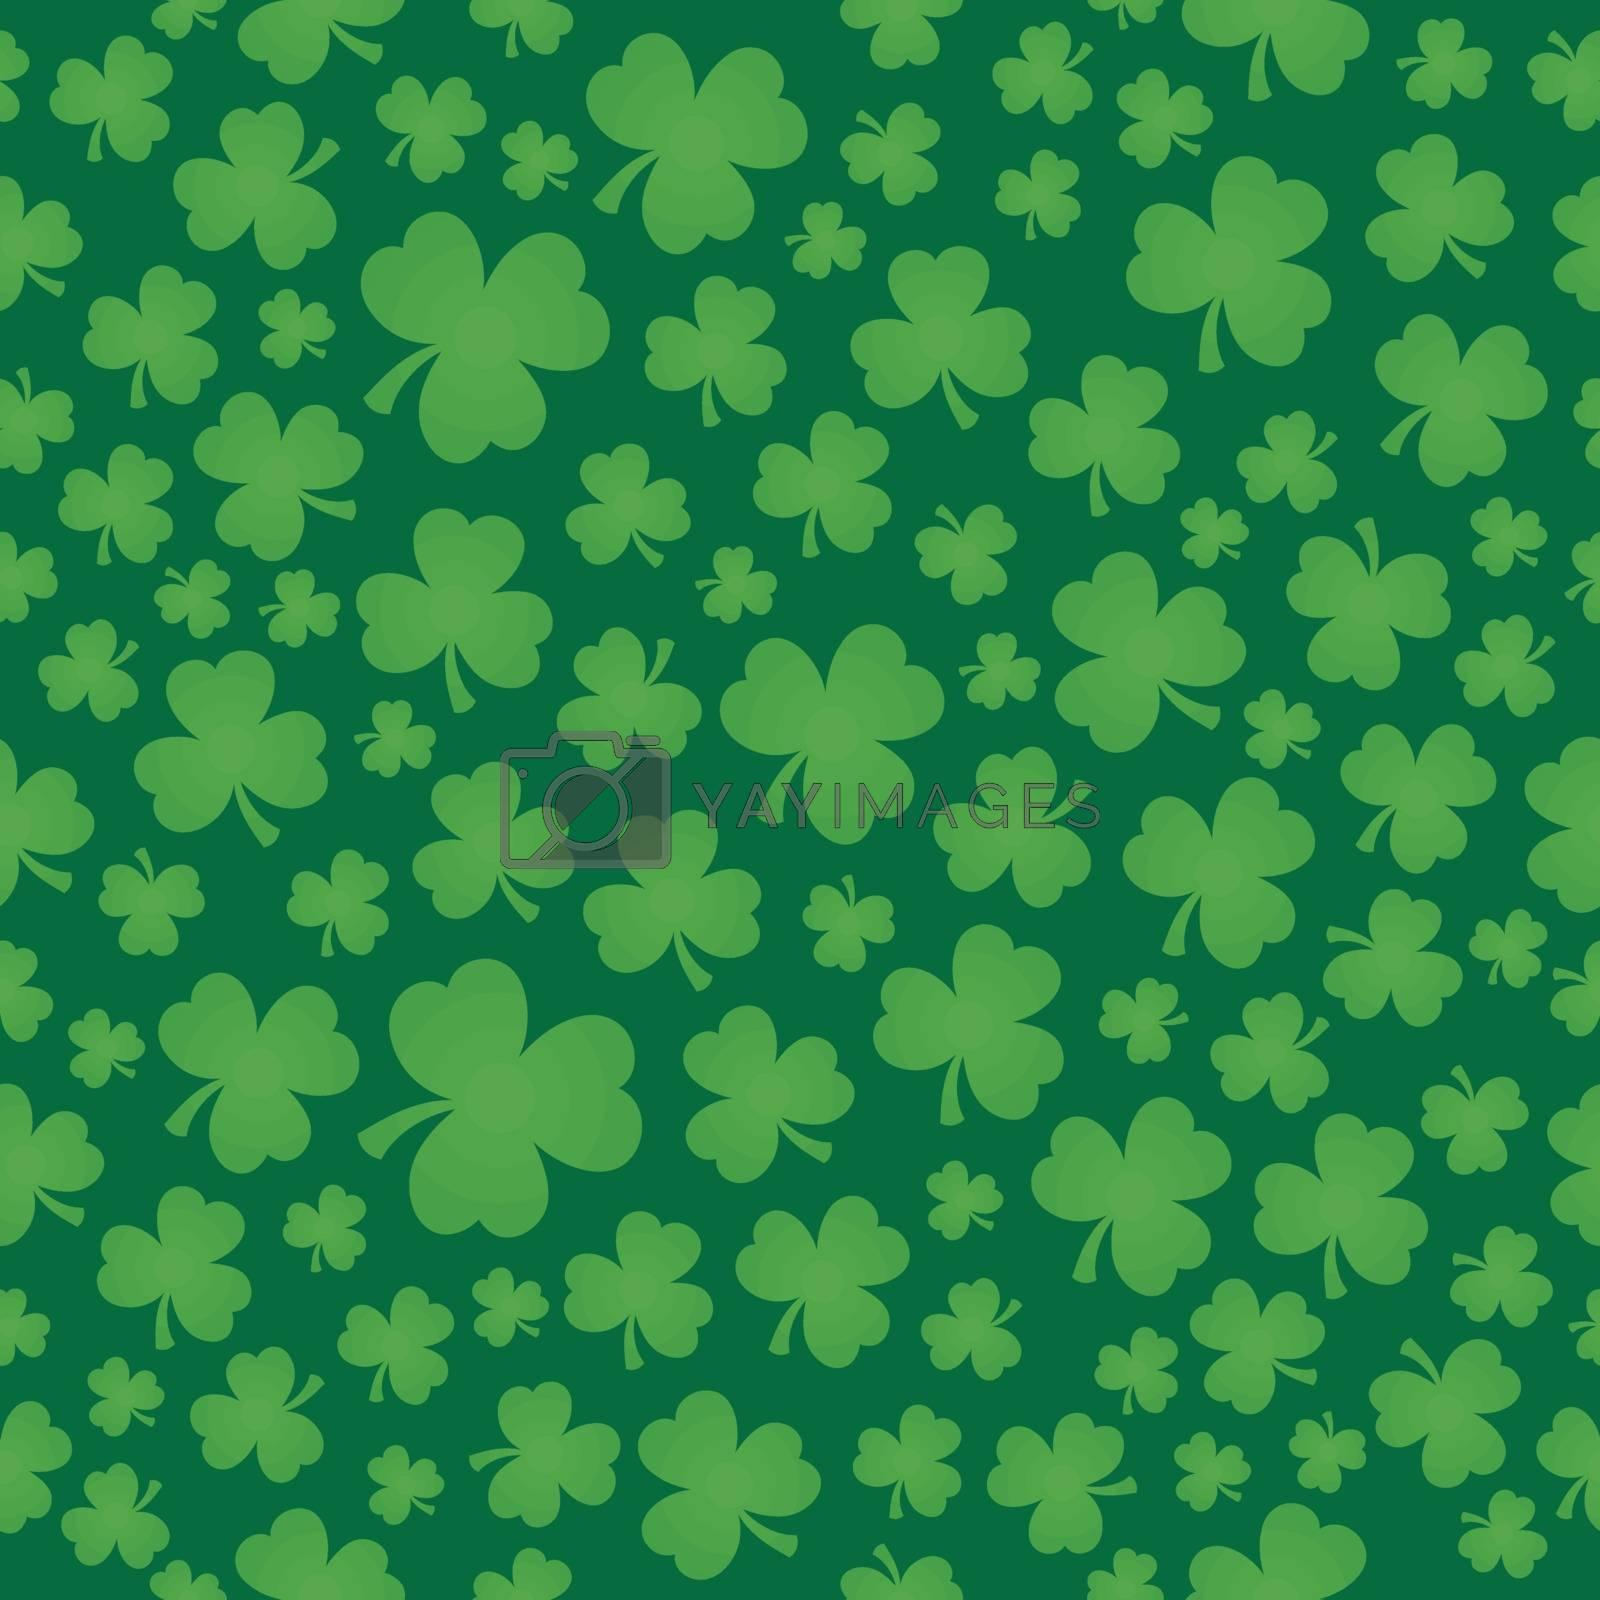 Three leaf clover seamless background 6 - eps10 vector illustration.